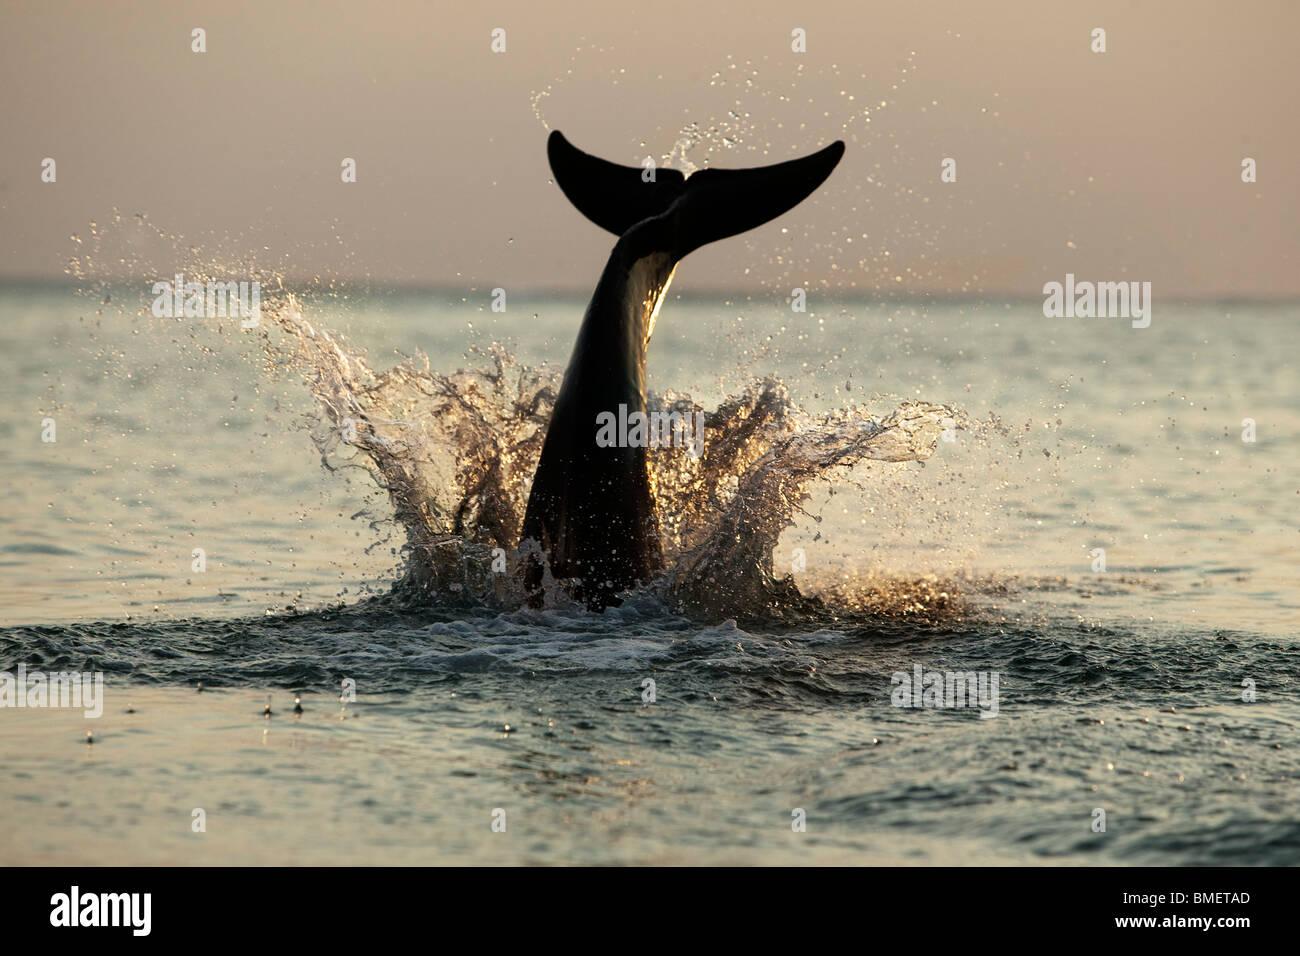 Bottlenose Dolphin splashing into the water at sunset, Honduras - Stock Image